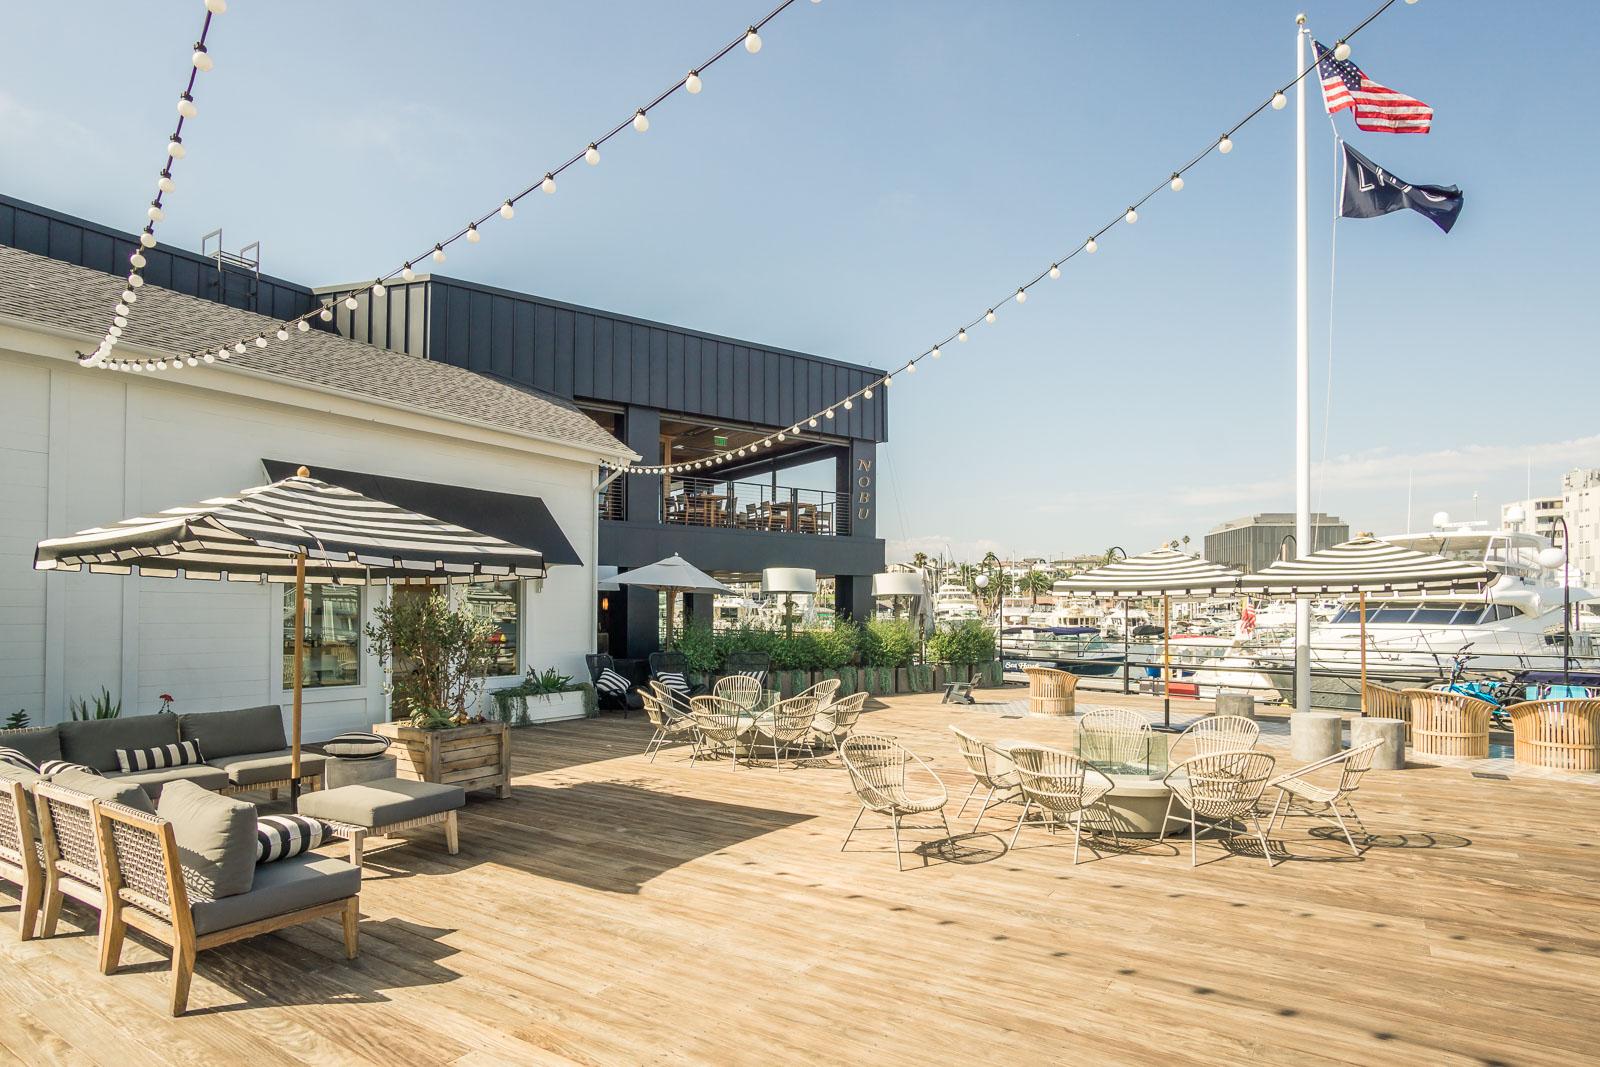 Lido Marina outdoor patio with restaurants andHarbor view from Nobu restaurant and Zinque restaurant